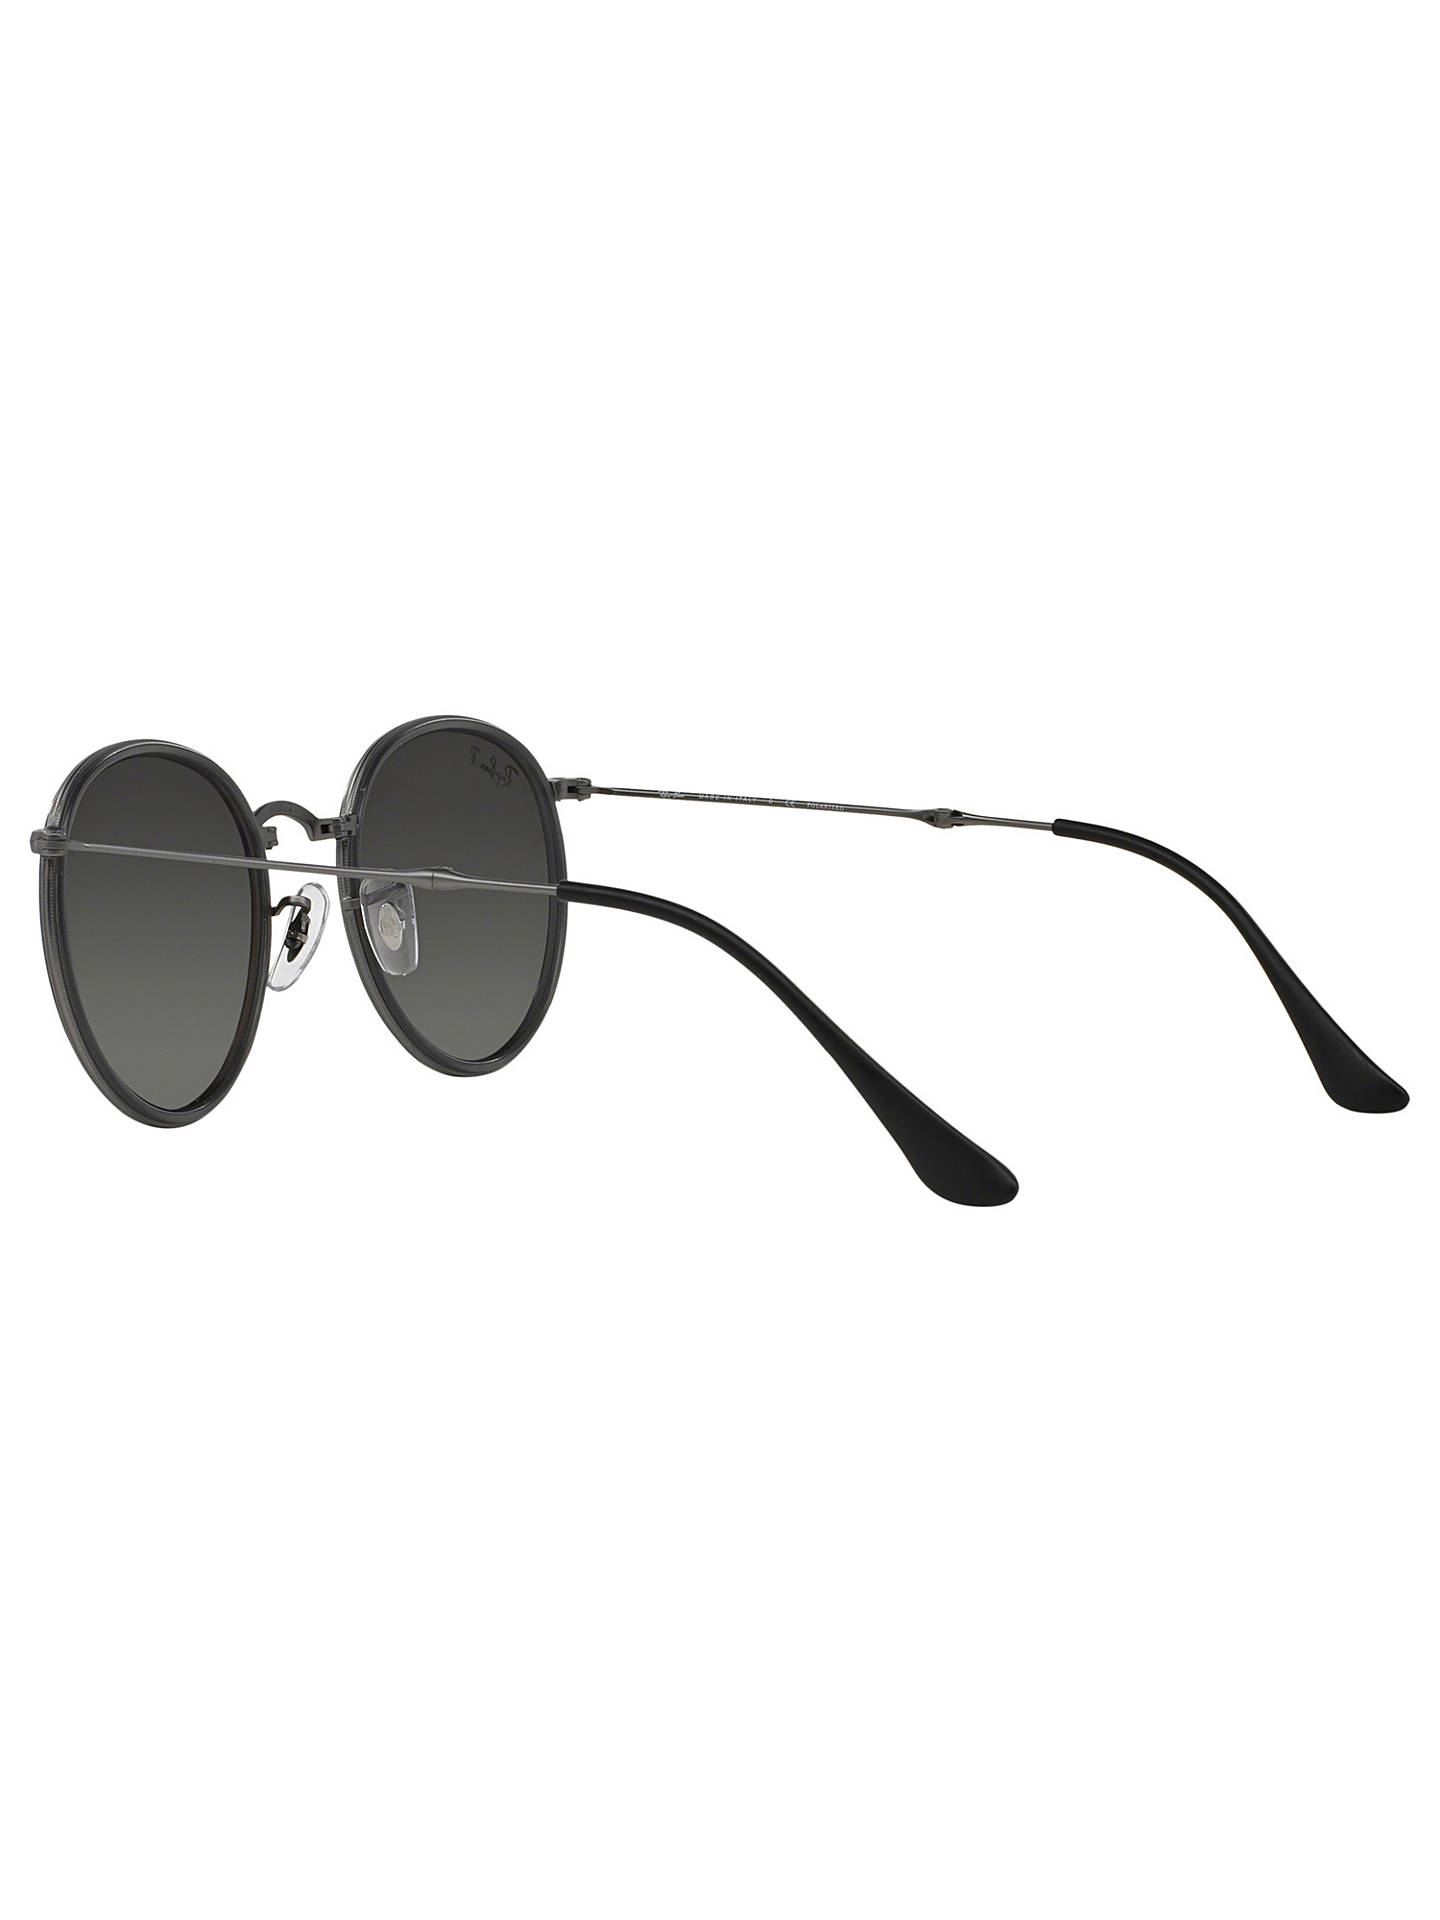 cc2712dc5209 ... Buy Ray-Ban RB3517 Polarised Round Folding Sunglasses, Gunmetal/Silver  Gradient Online at ...